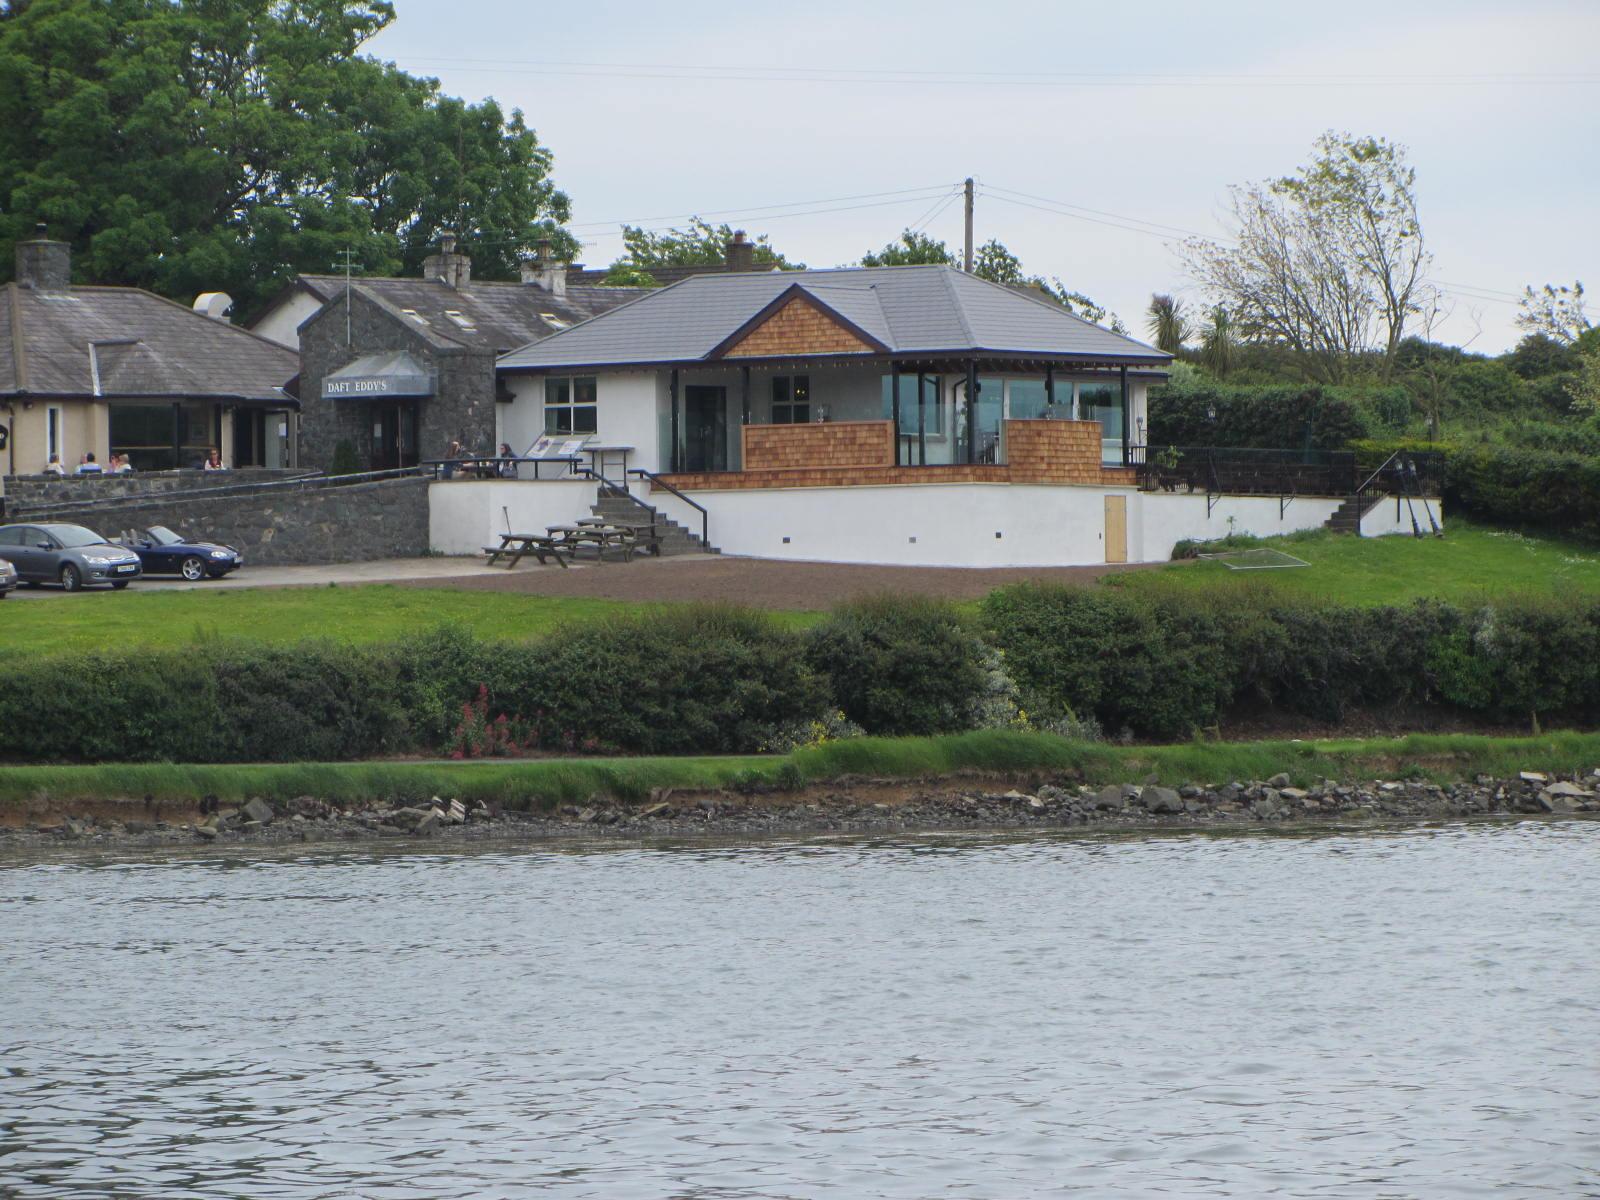 View of Daft Eddy's